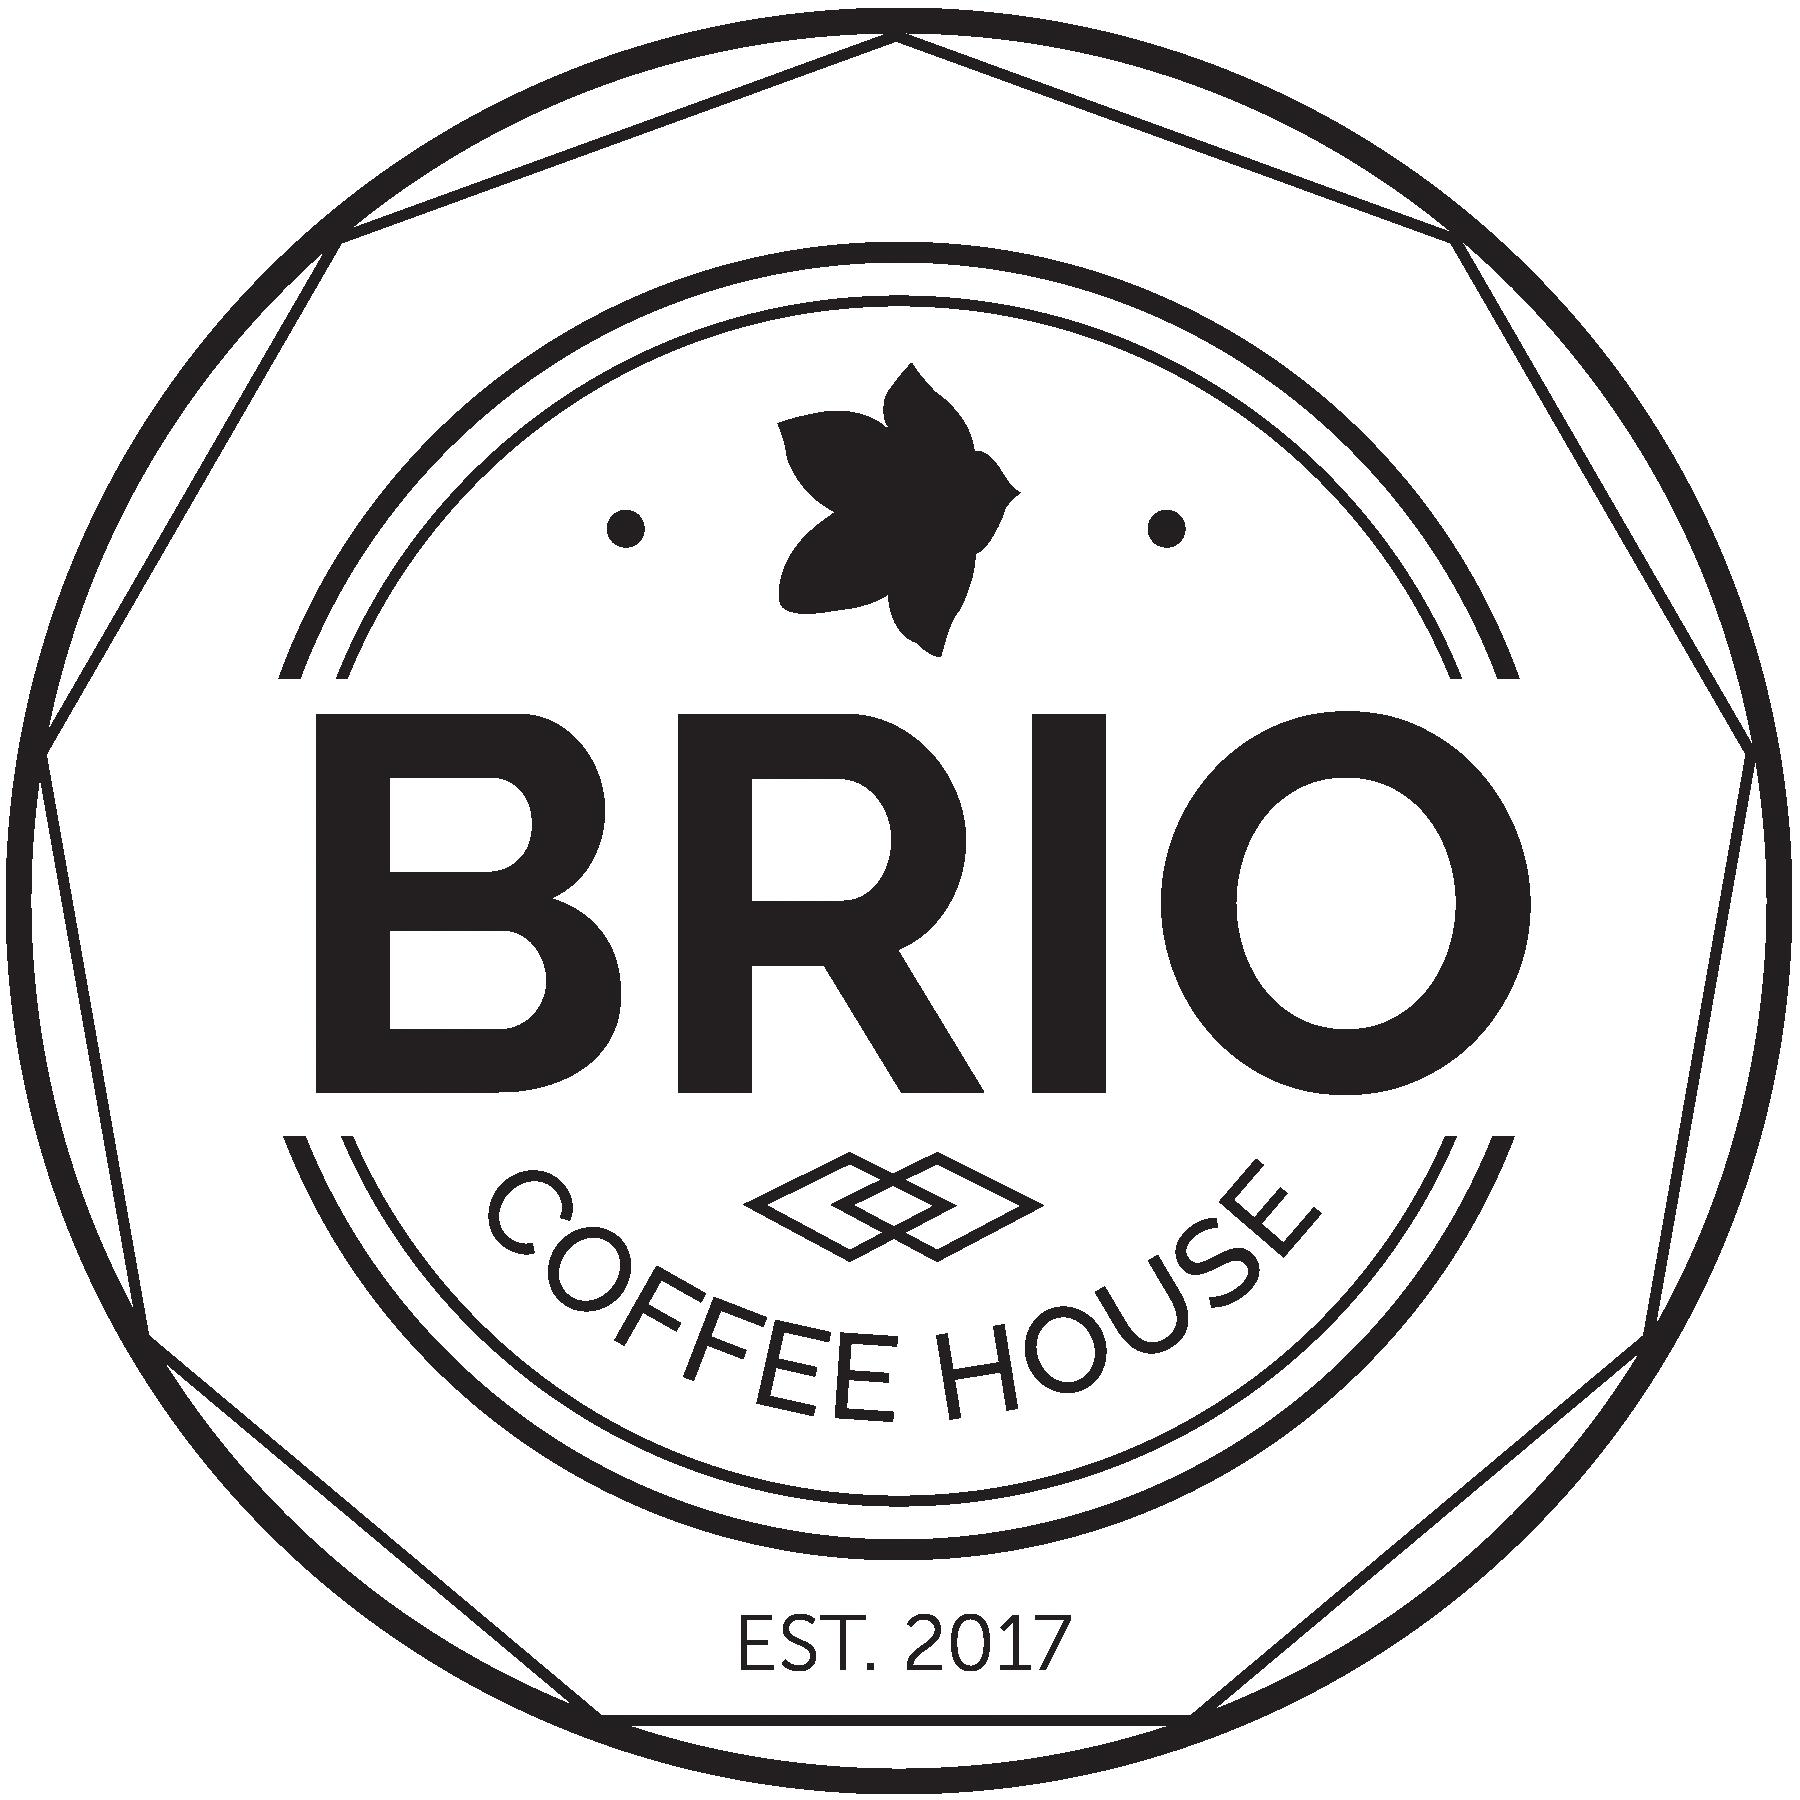 Brio Coffeehouse Inc